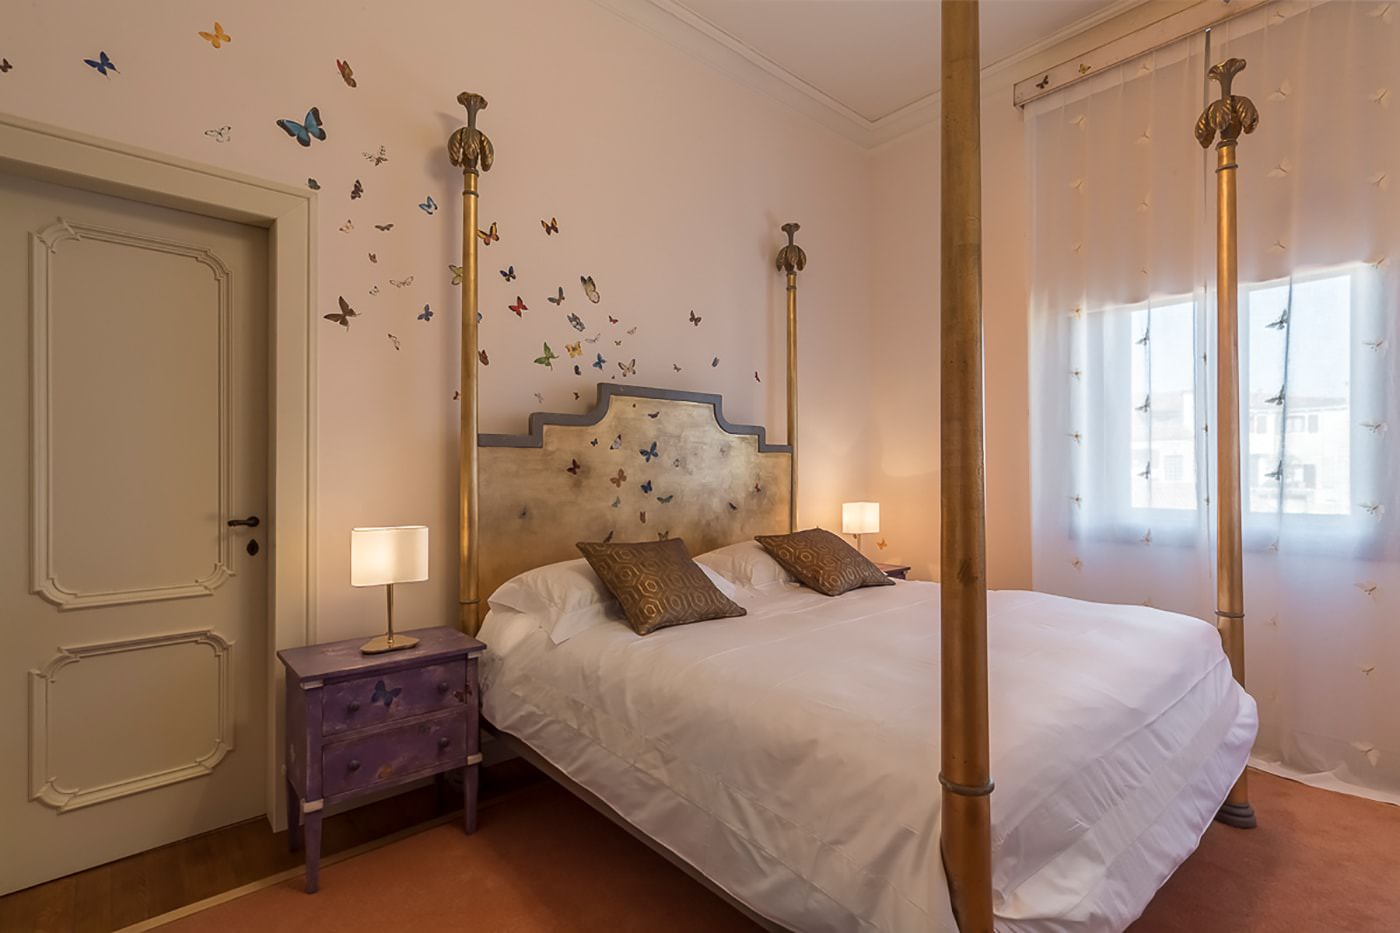 Custom Bed And Decoration By Porte Italia Venezia2